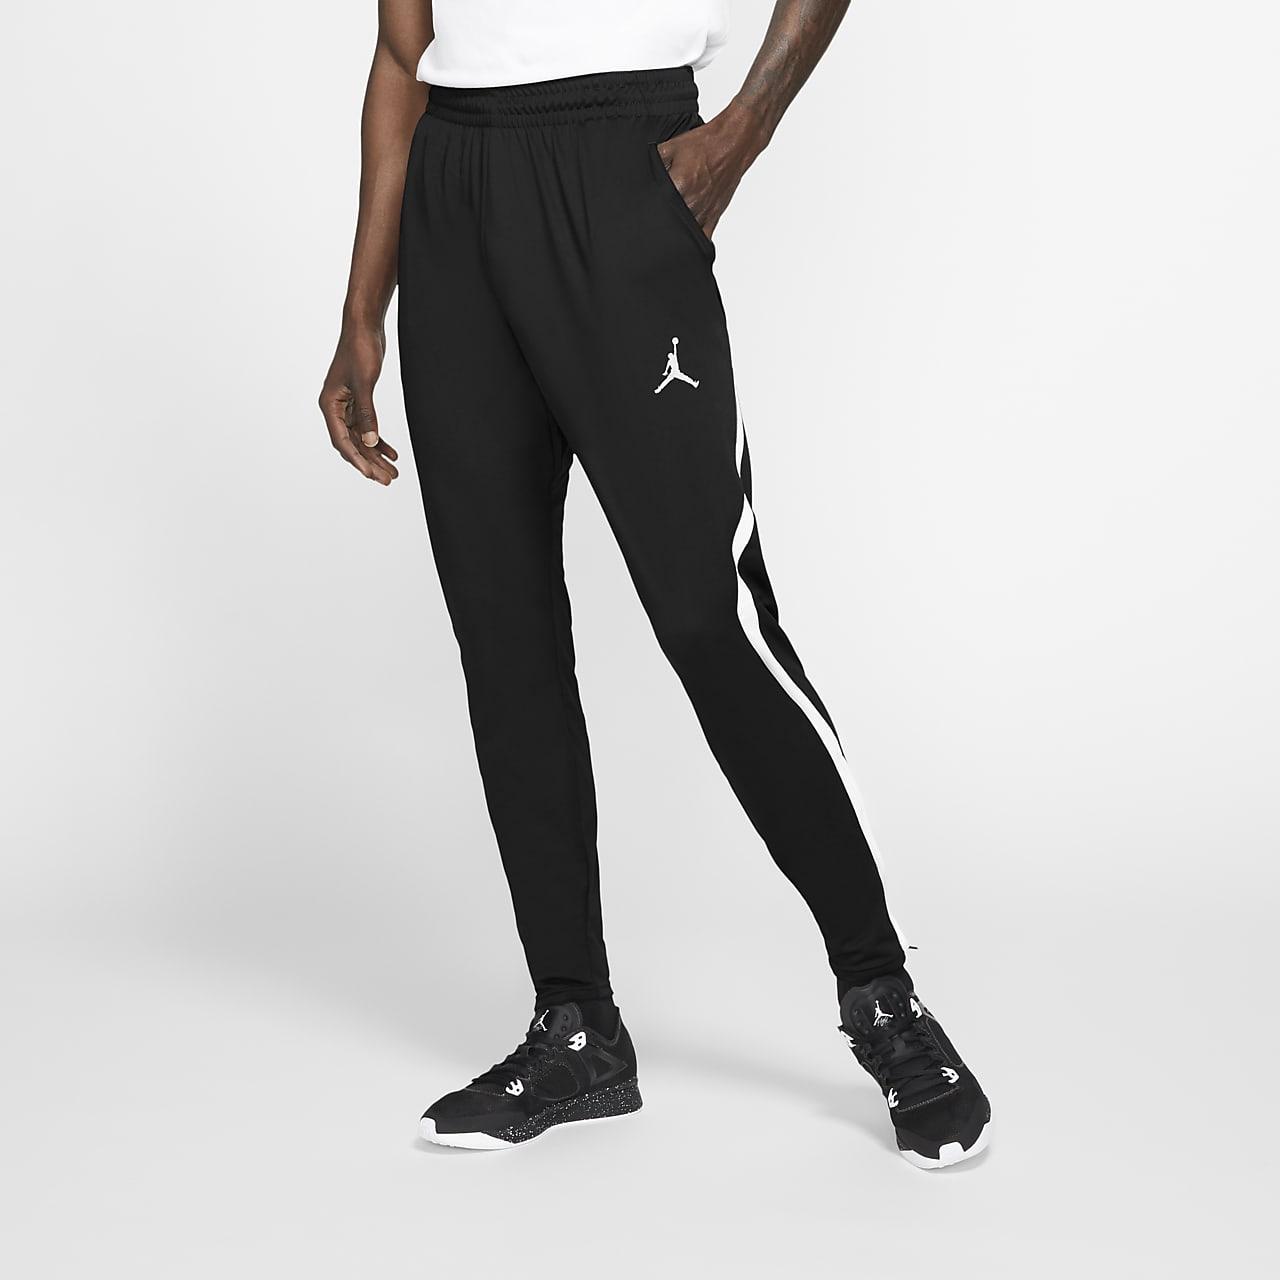 Jordan Dri-FIT 23 Alpha Men's Basketball Trousers